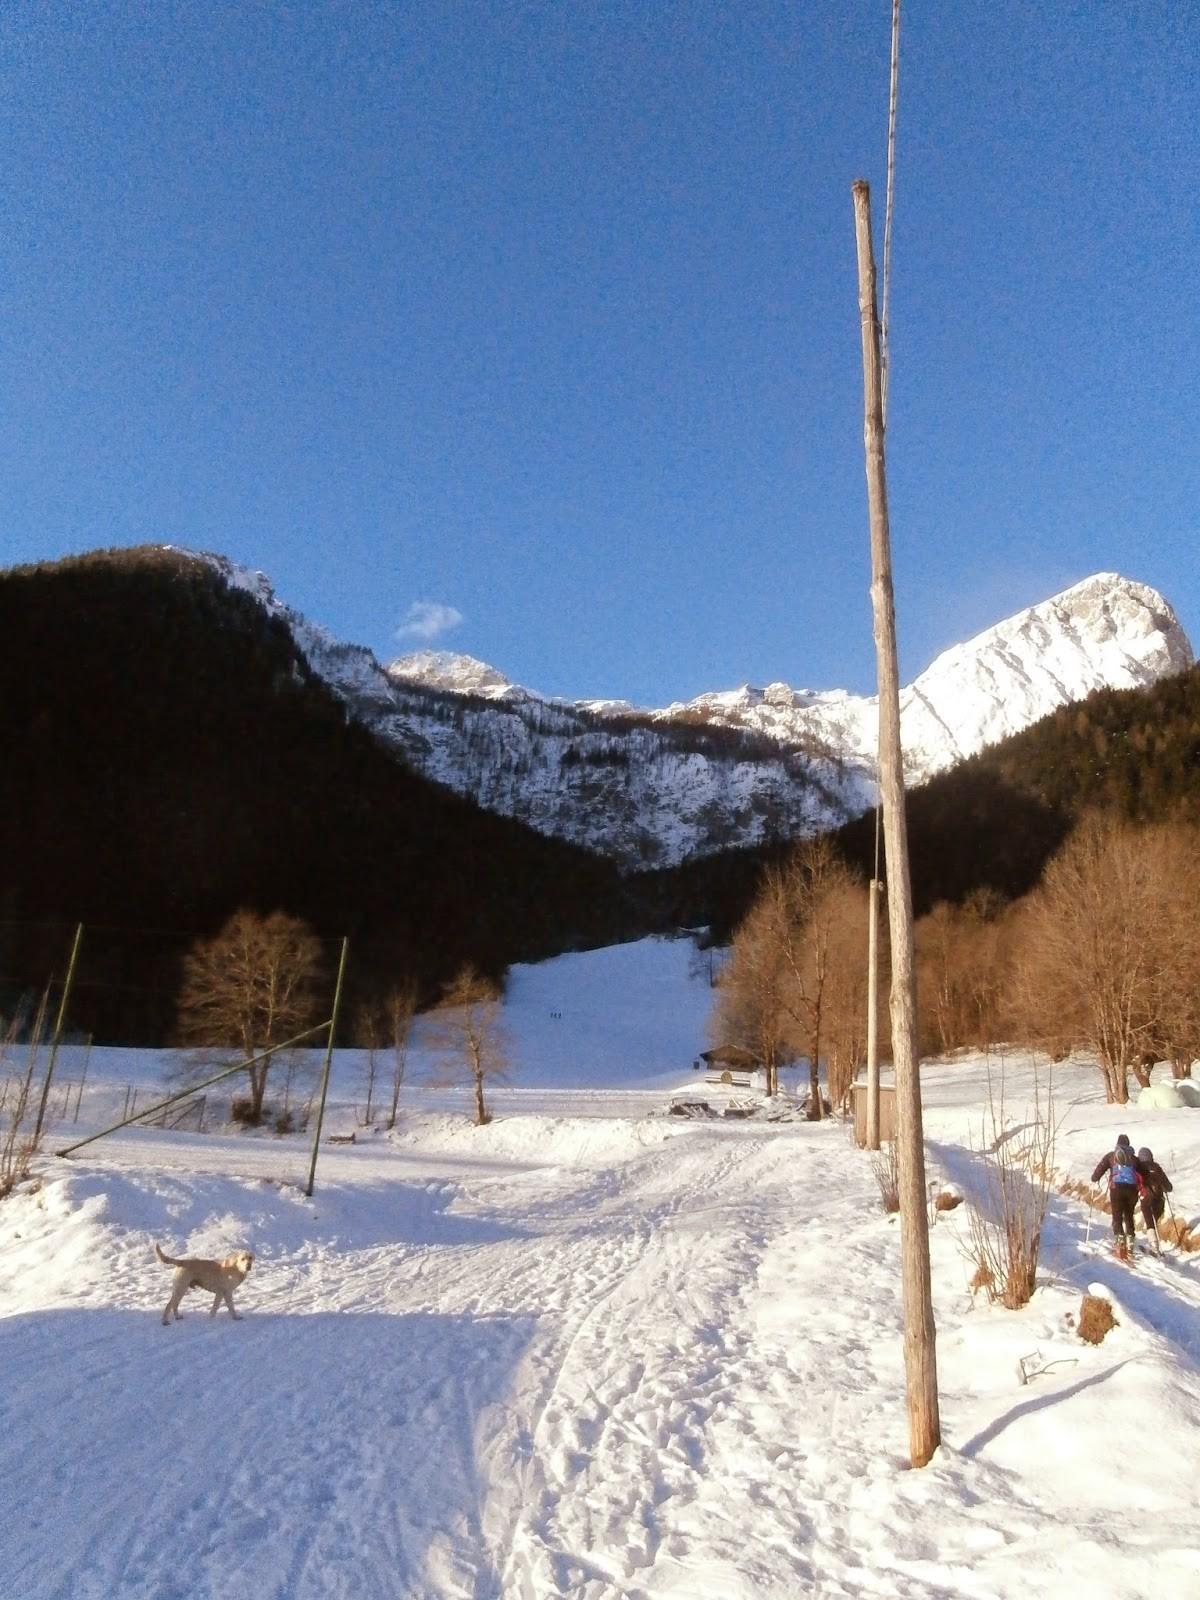 Barbarossa, neve fresca e vento